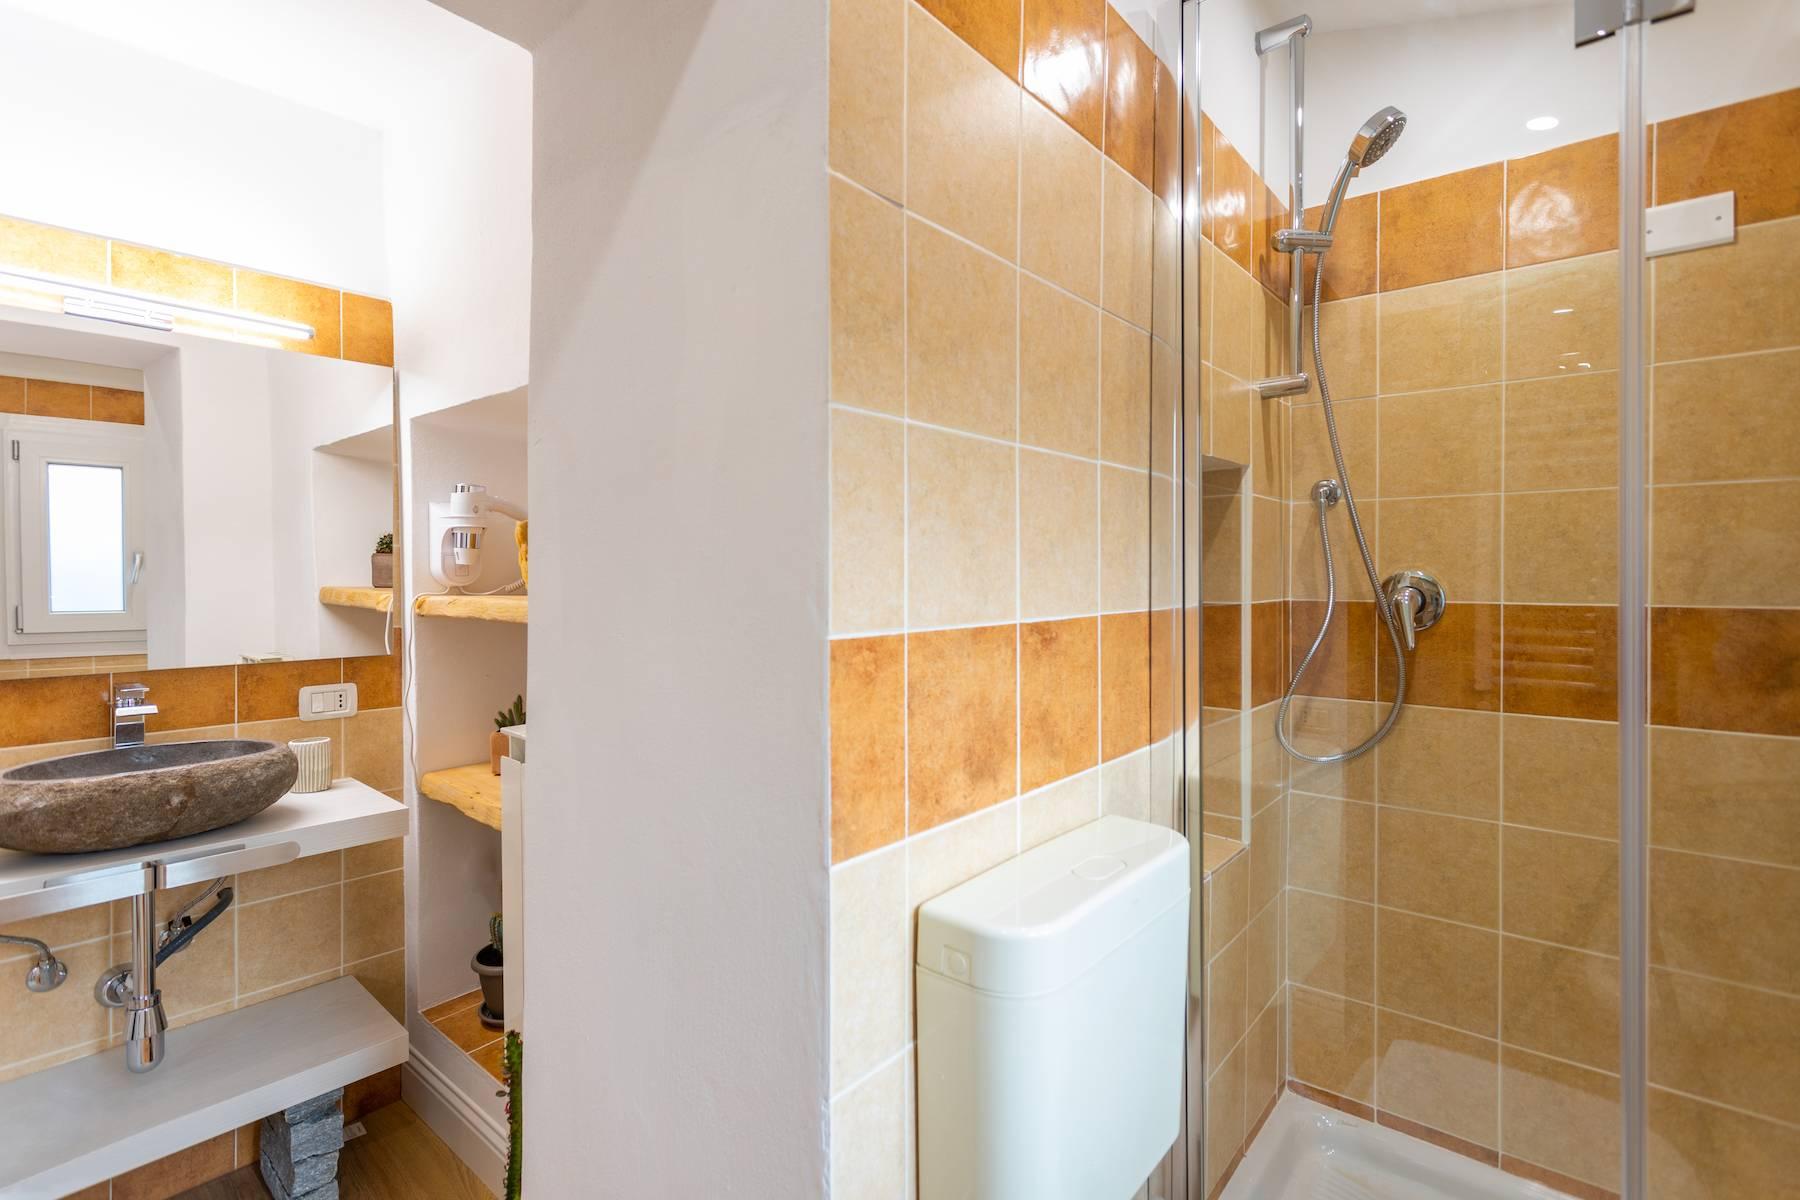 Appartamento in Vendita a Belgirate: 3 locali, 62 mq - Foto 23